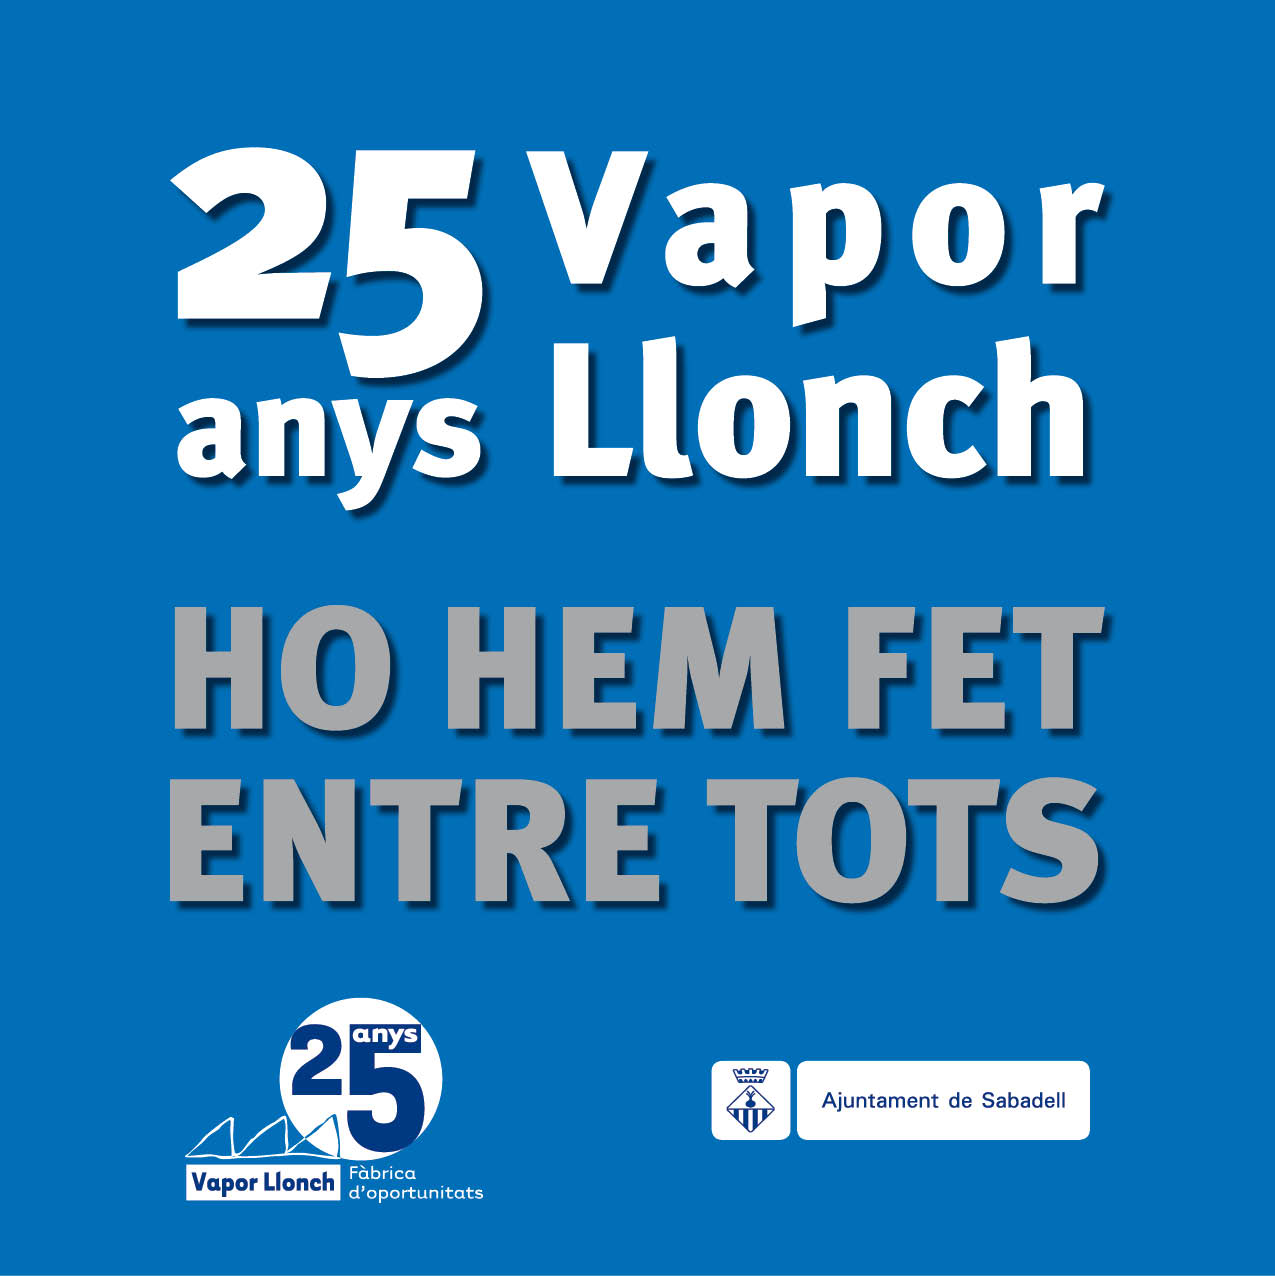 25 anys Vapor Llonch